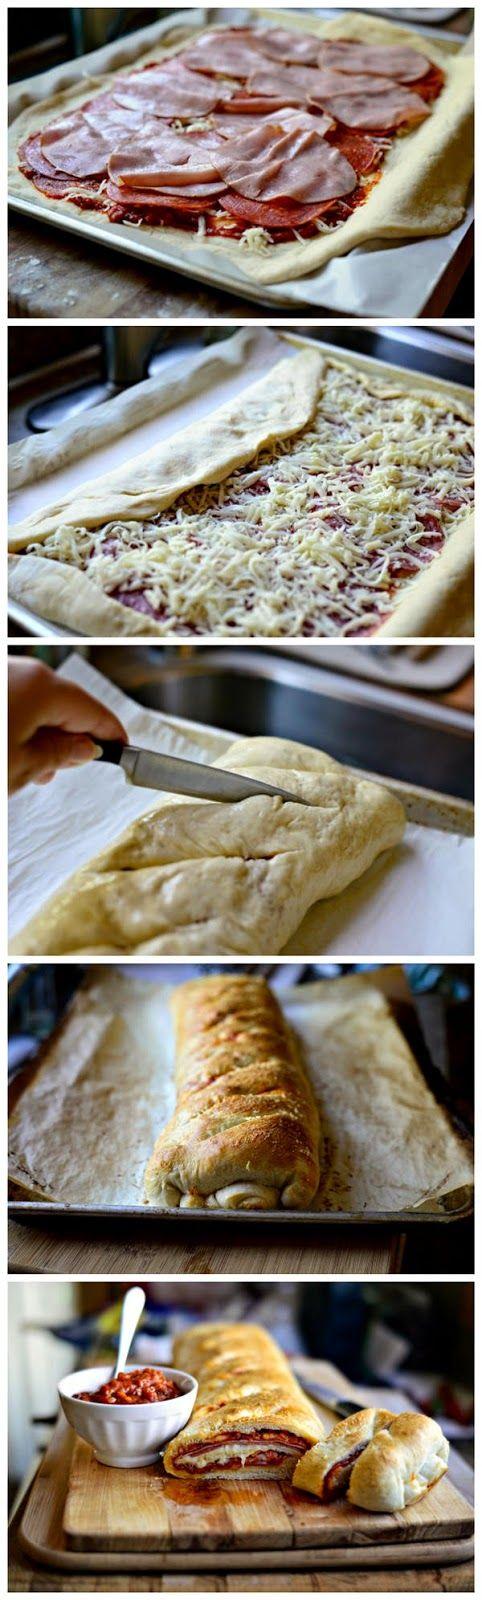 Homemade Stromboli - kitchenclouds